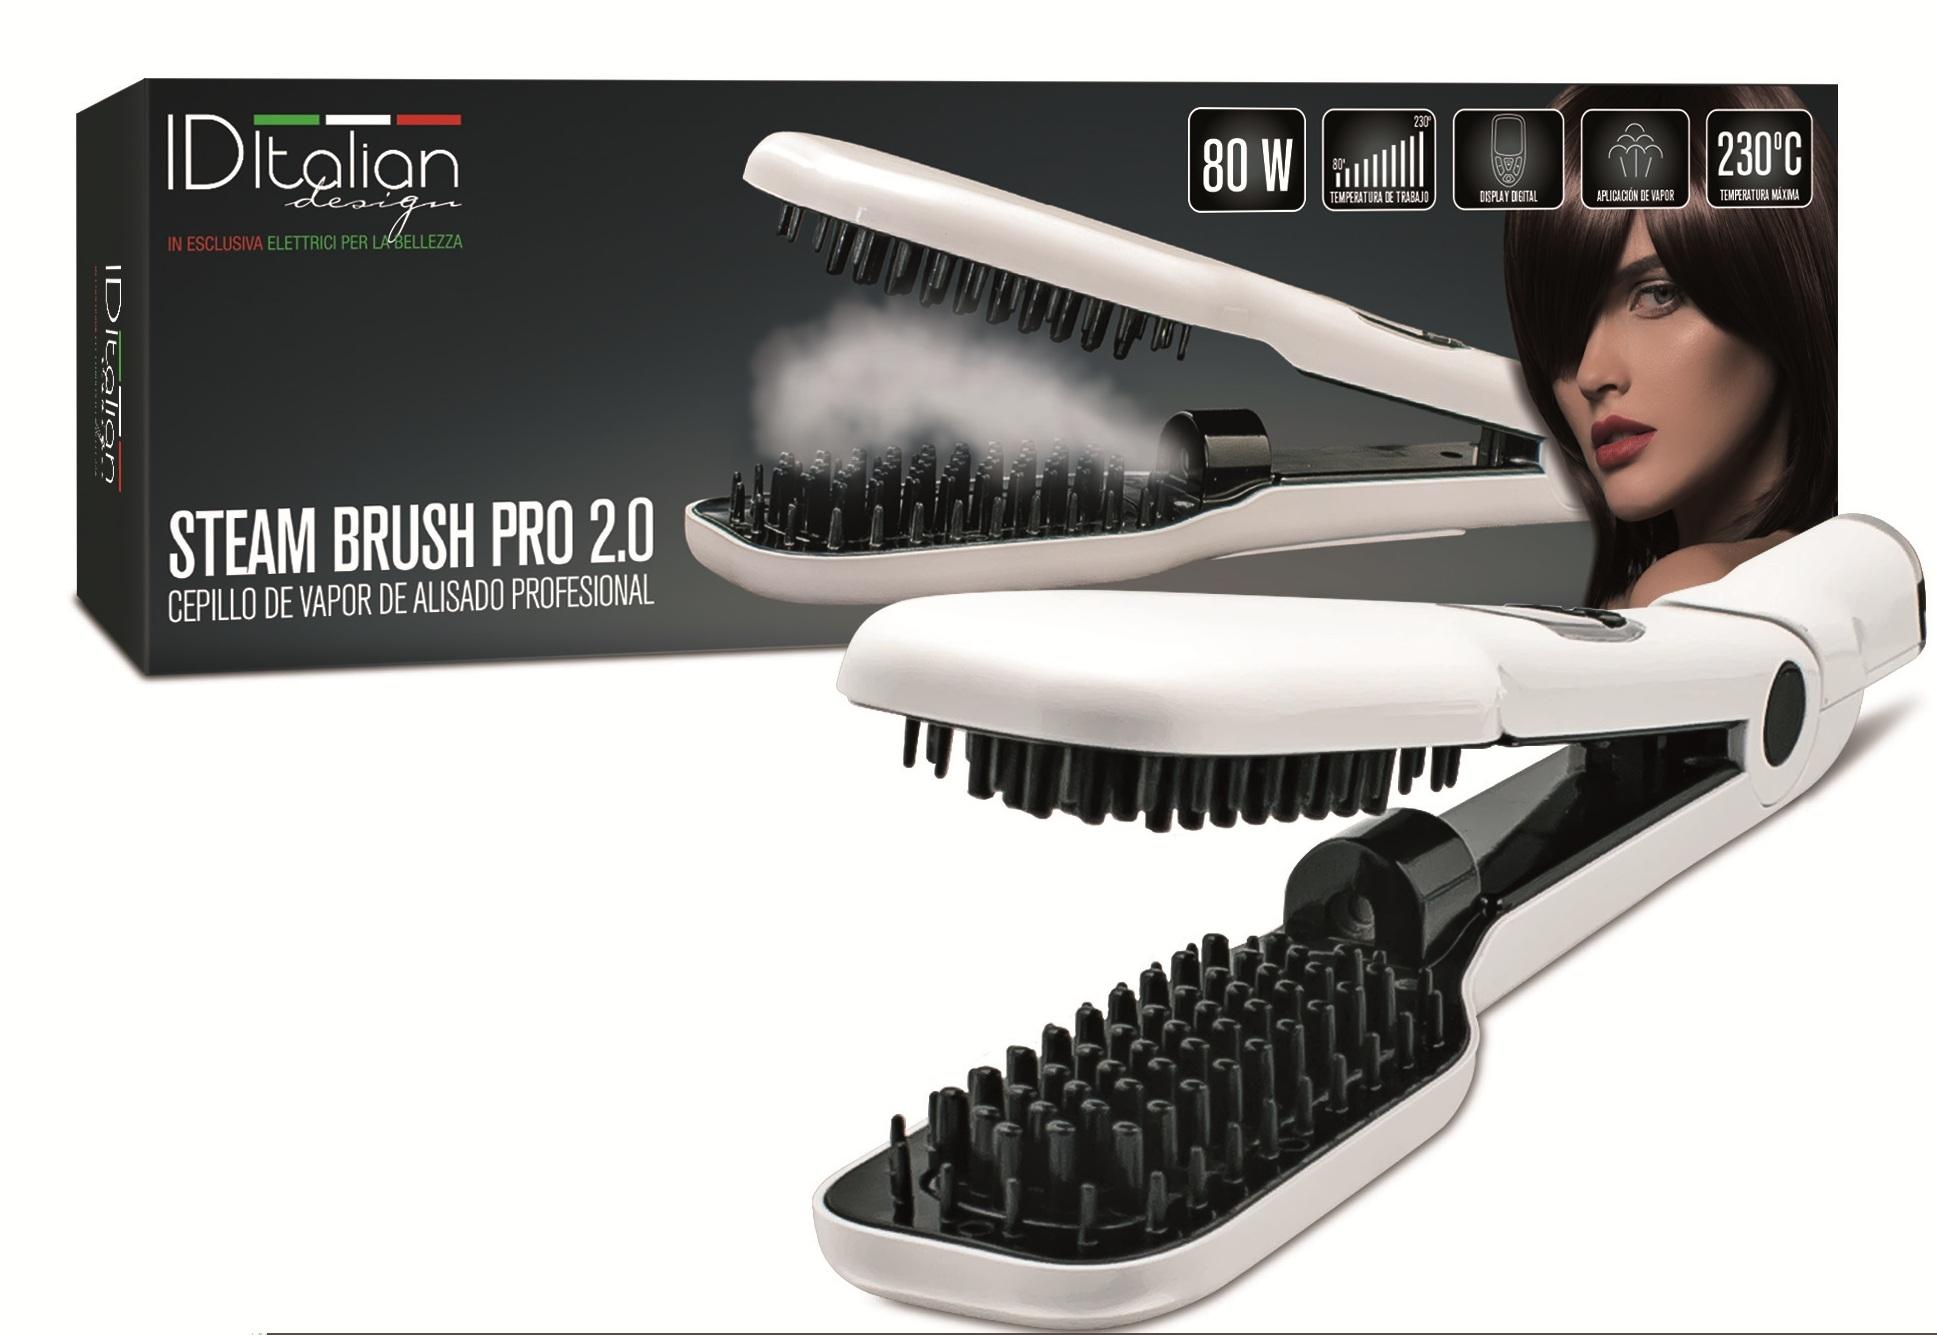 Comprar Cepillo Profesional Plancha Oferta 39 95 De Pelo Alisado Plancha De Vapor Iditalian